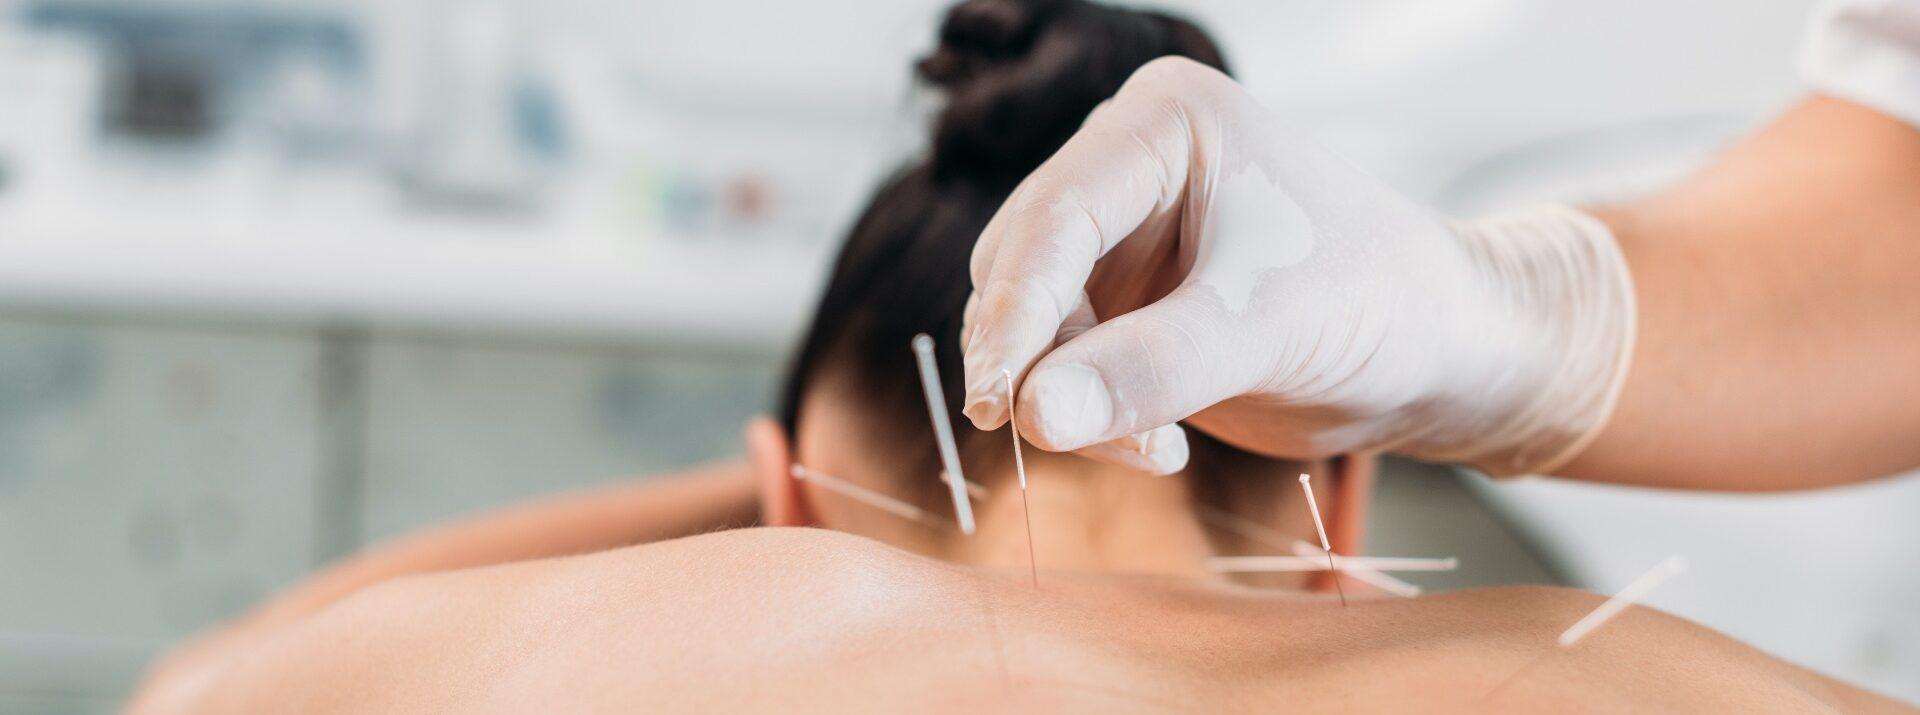 akupunktur ryggen